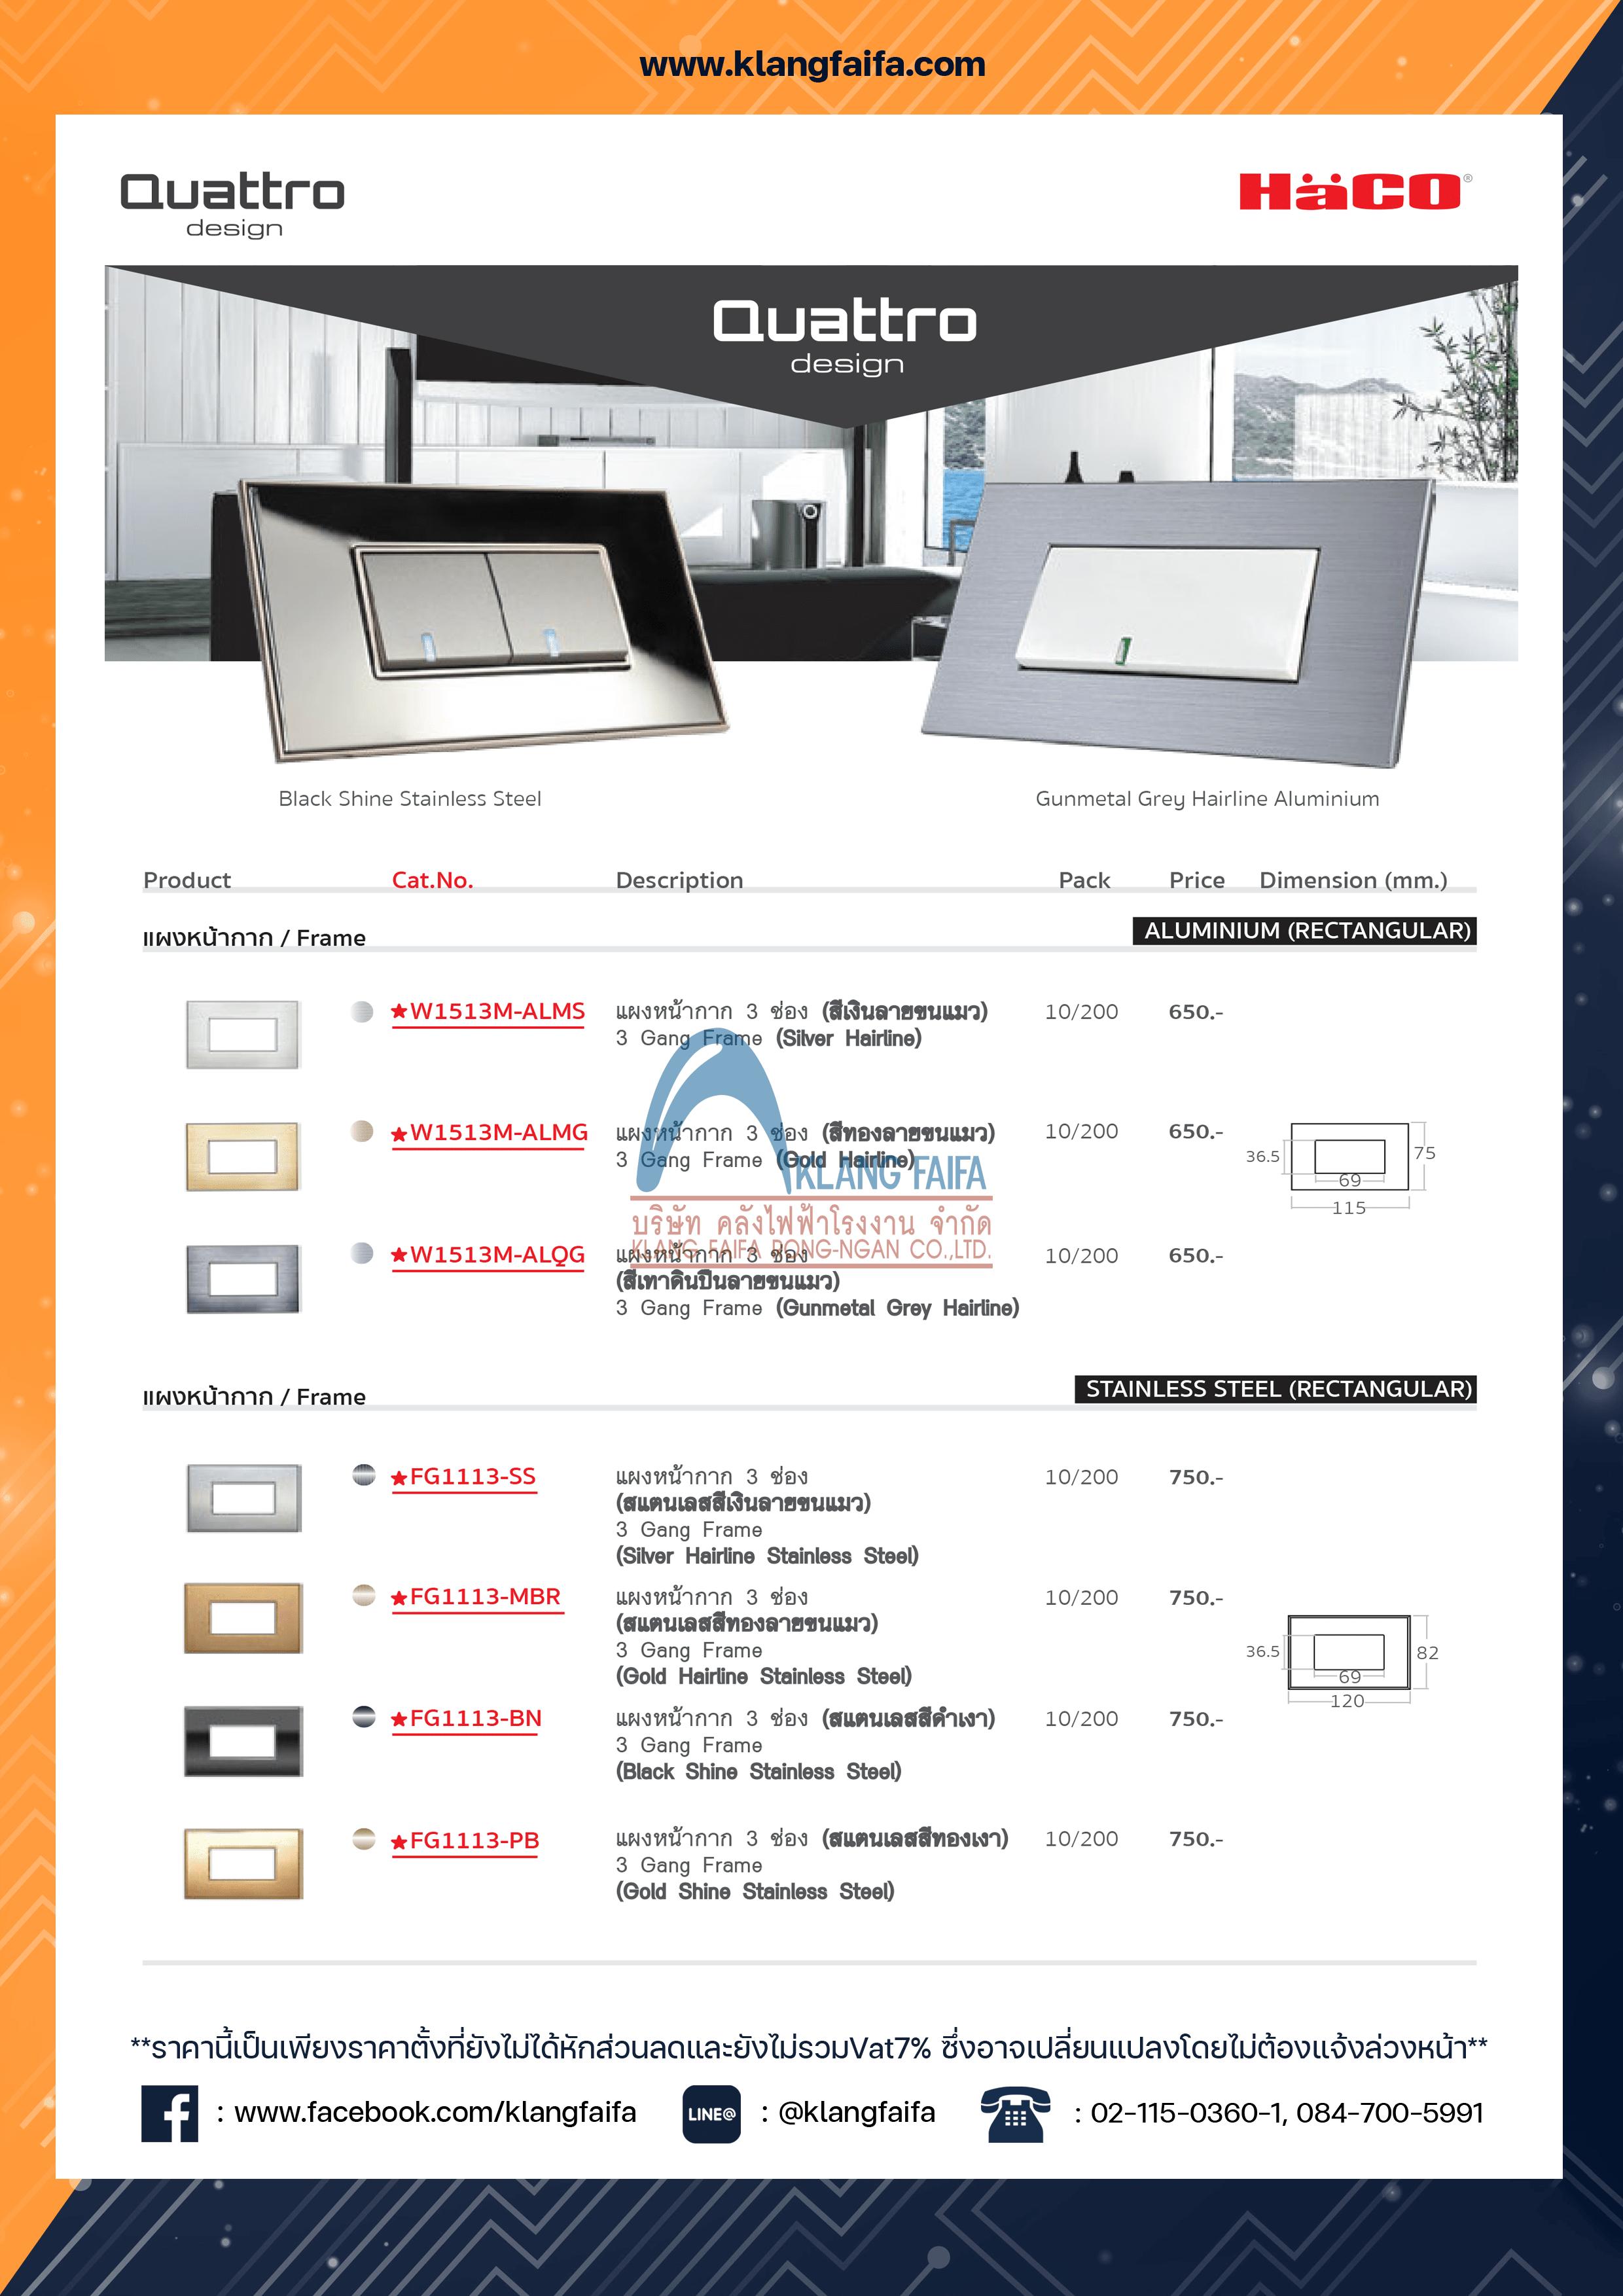 Haco, ฮาโก้,  Quattro, ควอโต, Floor Outlets, Convenient Floor Wall&lamp; Table Sockets, เต้ารับฝังพื้น,